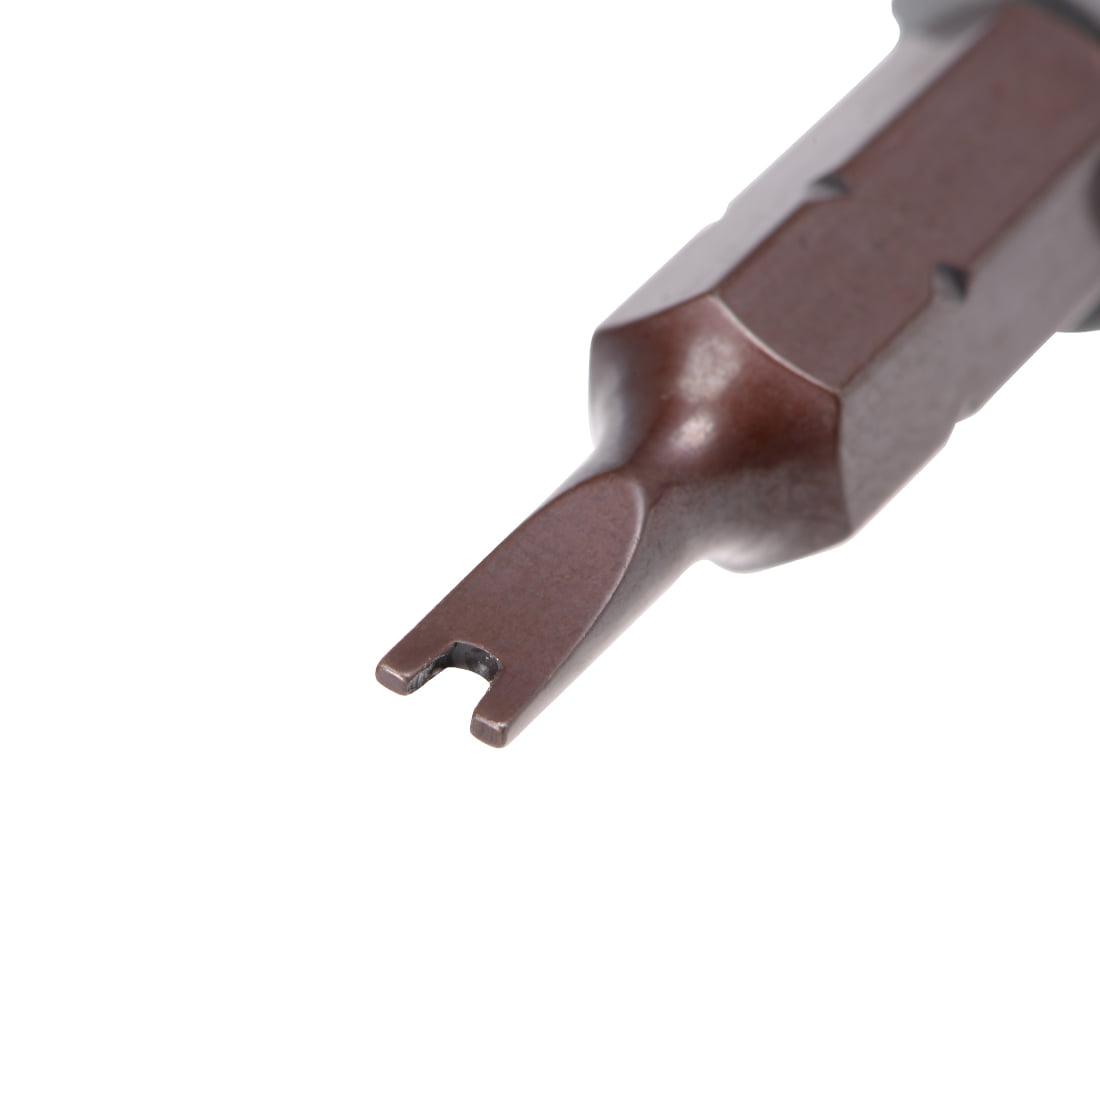 4Pcs 1/4-Inch Hex Shank 25mm Length U2 U Shape Screwdriver Drill Bits - image 3 of 4